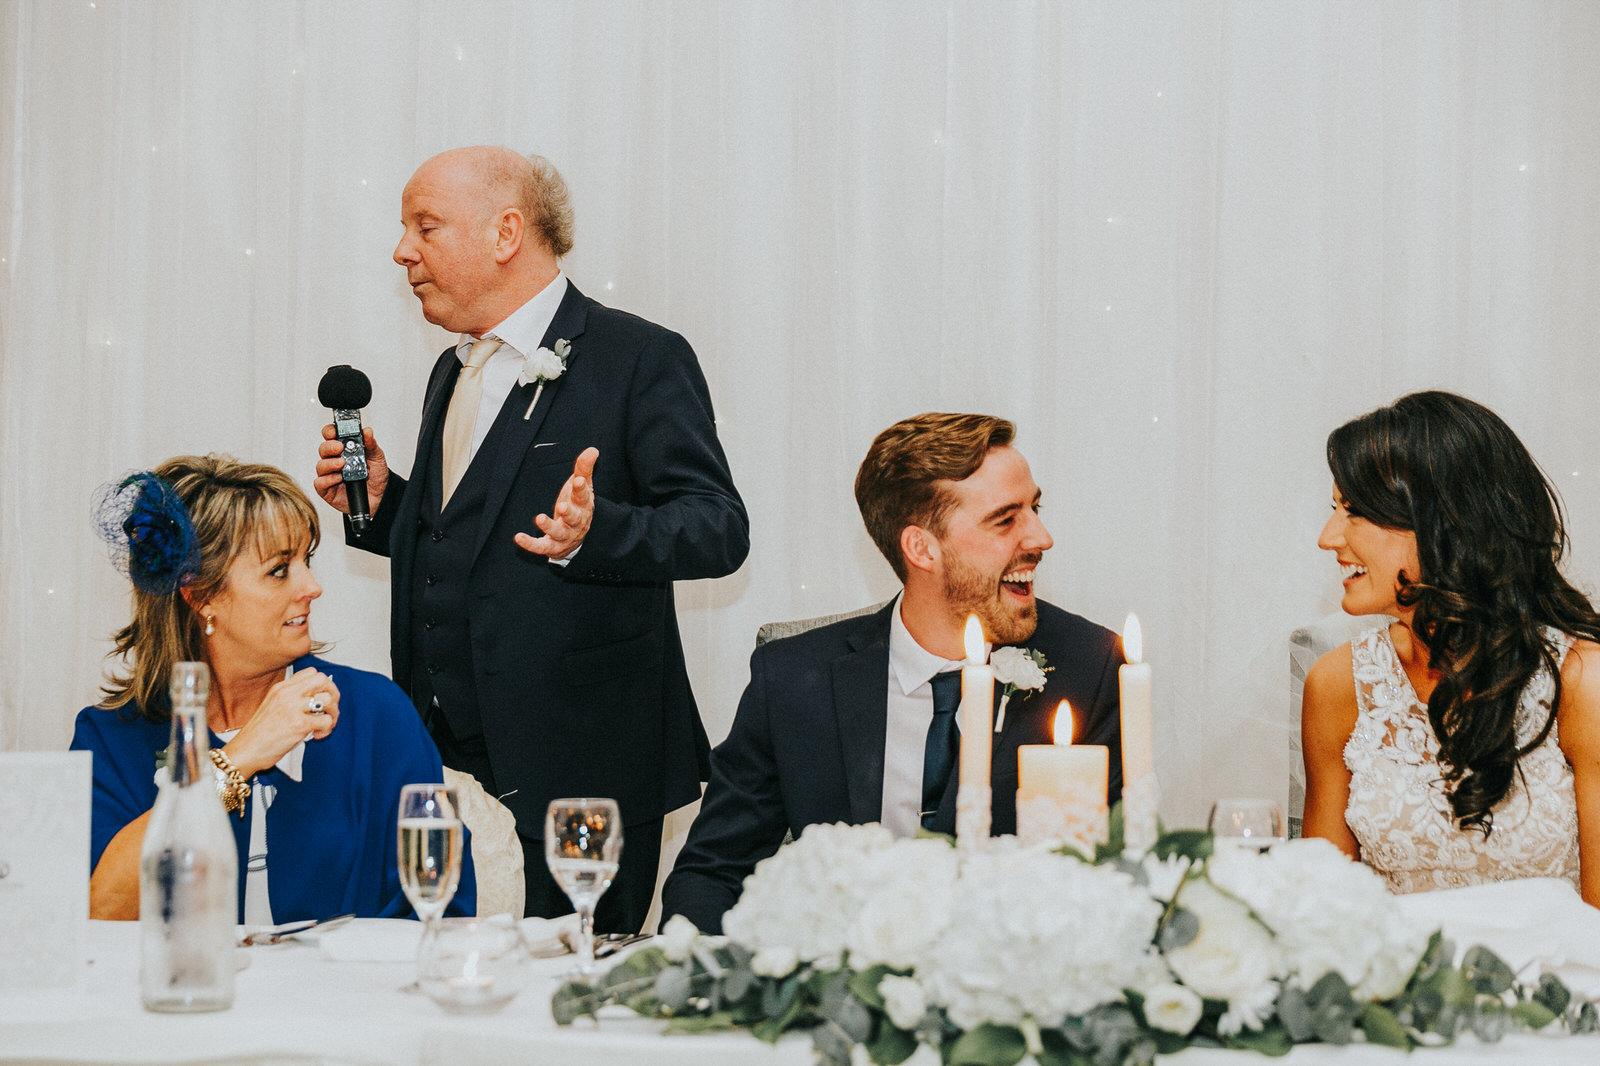 Roger_Kenny_wedding_photographer_502.jpg